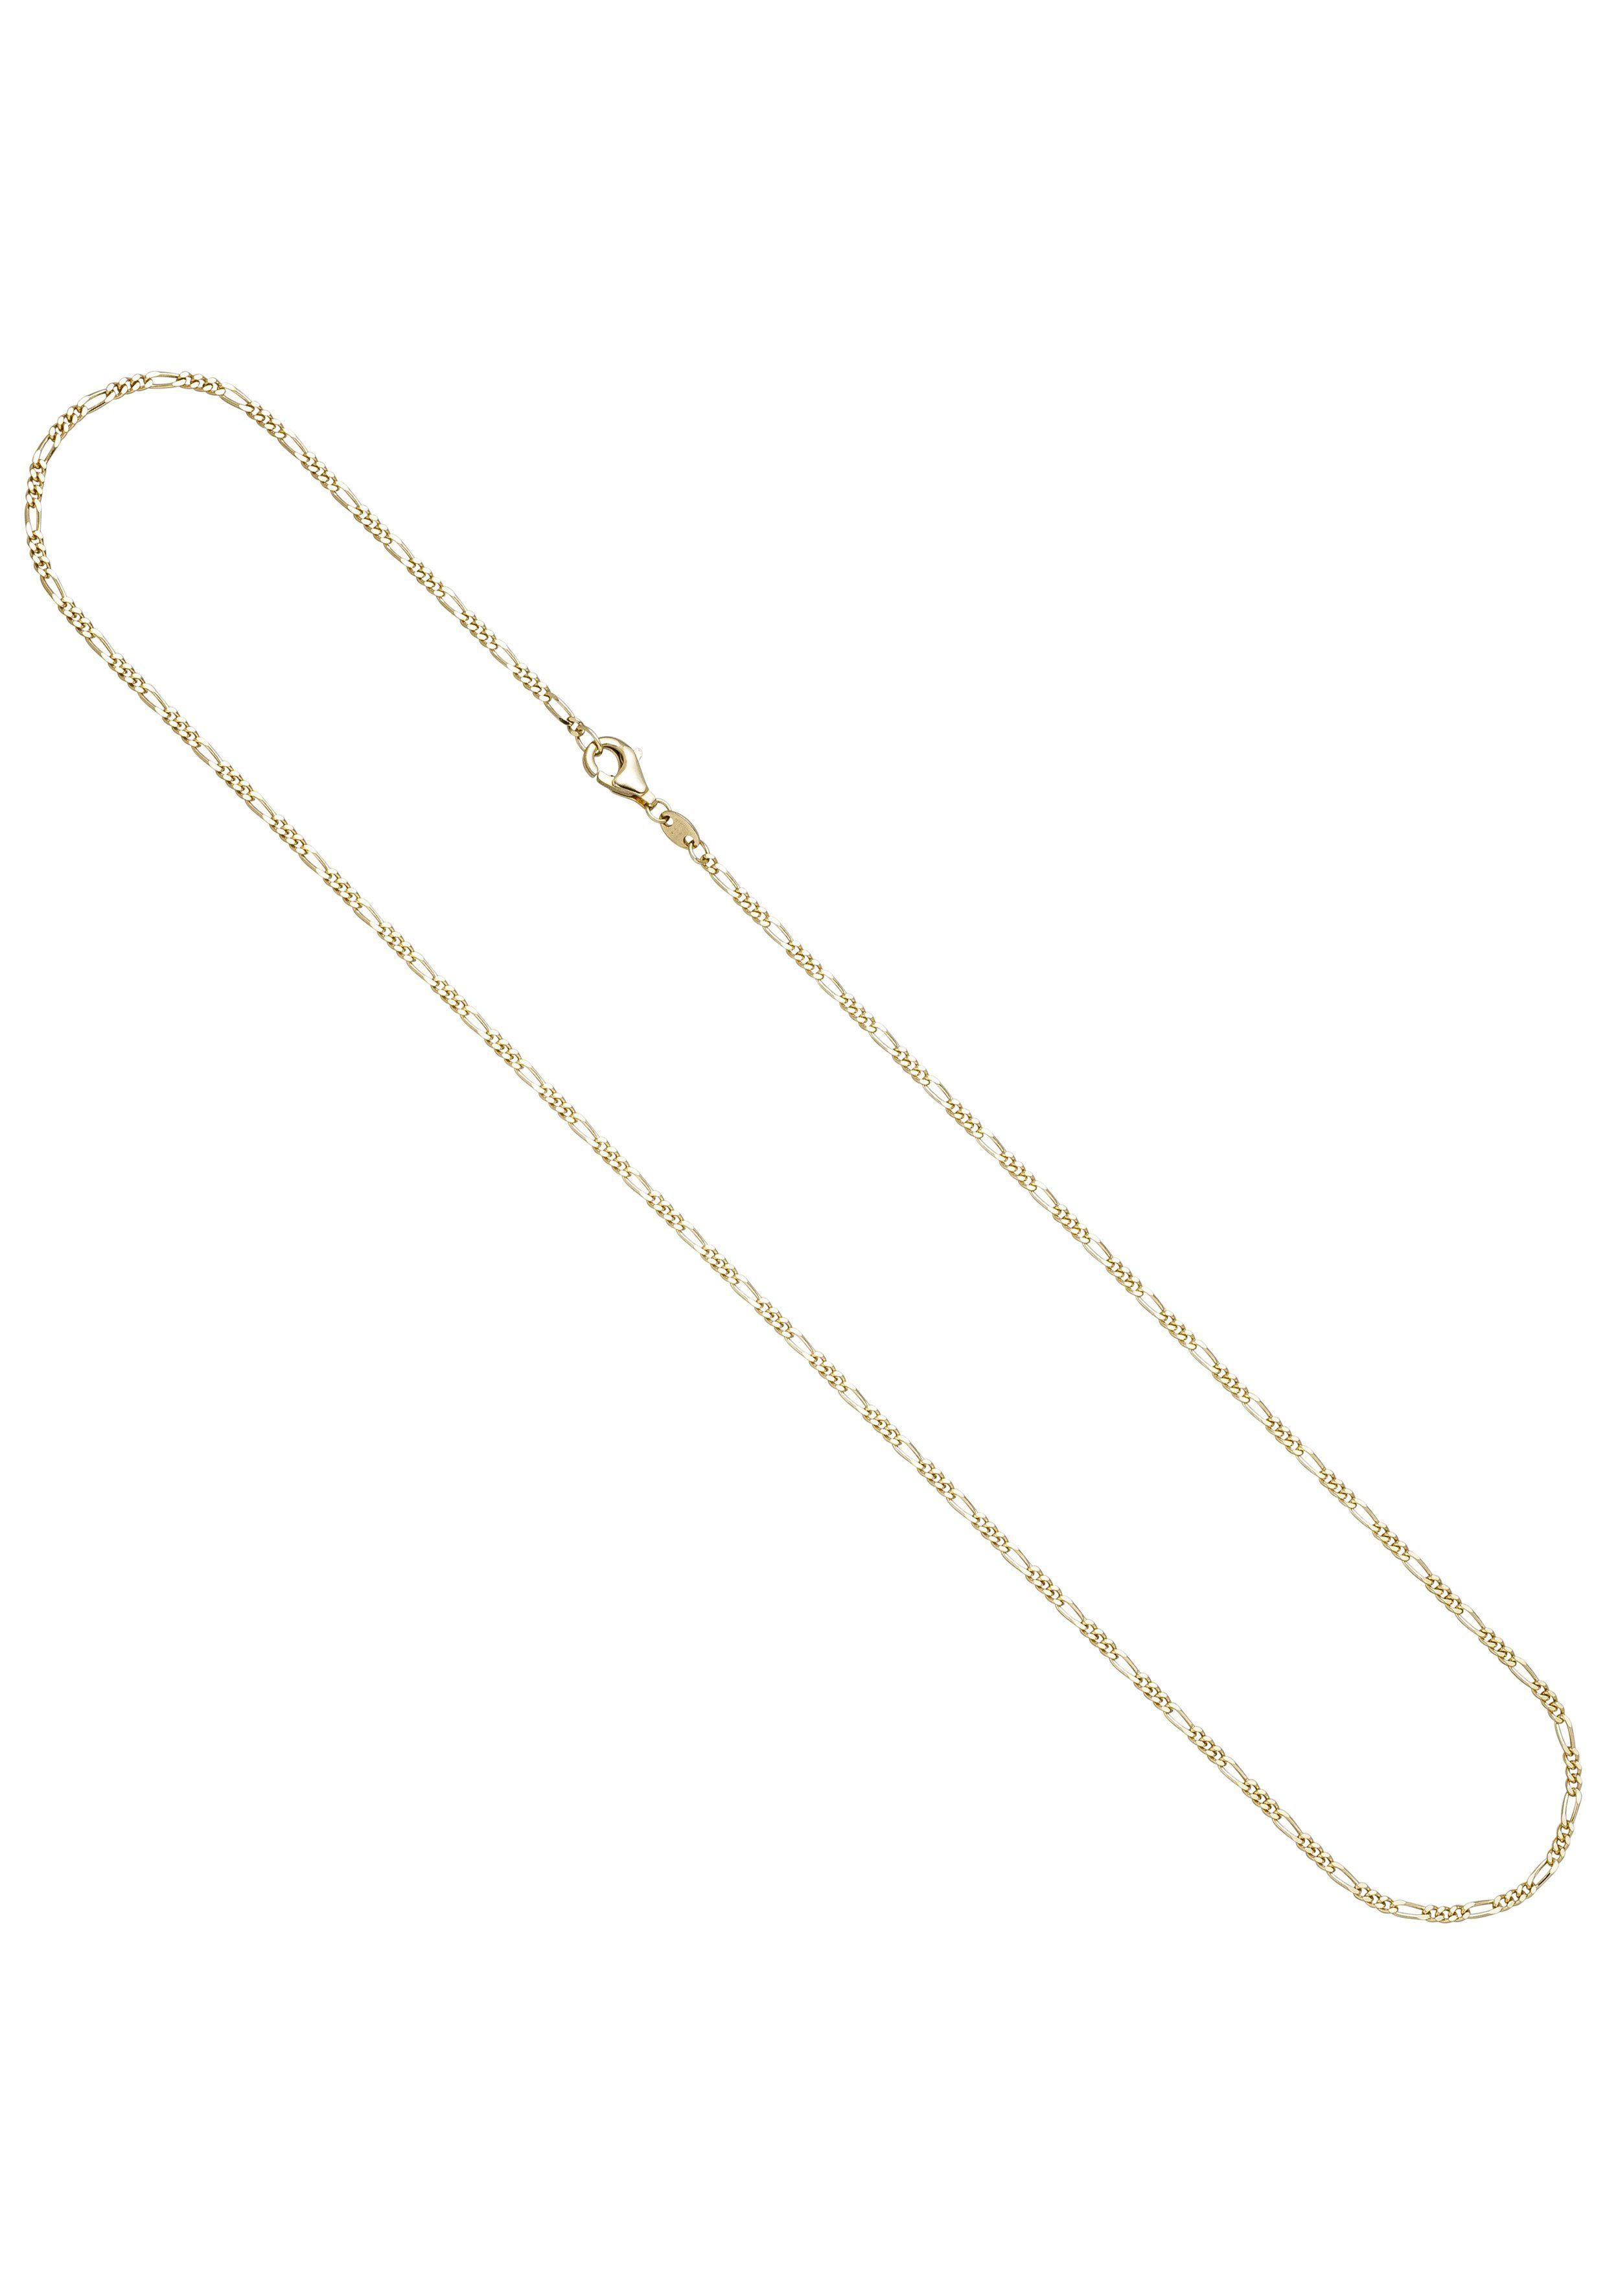 JOBO Goldkette Figarokette 585 Gold diamantiert 1,7 mm 45 cm